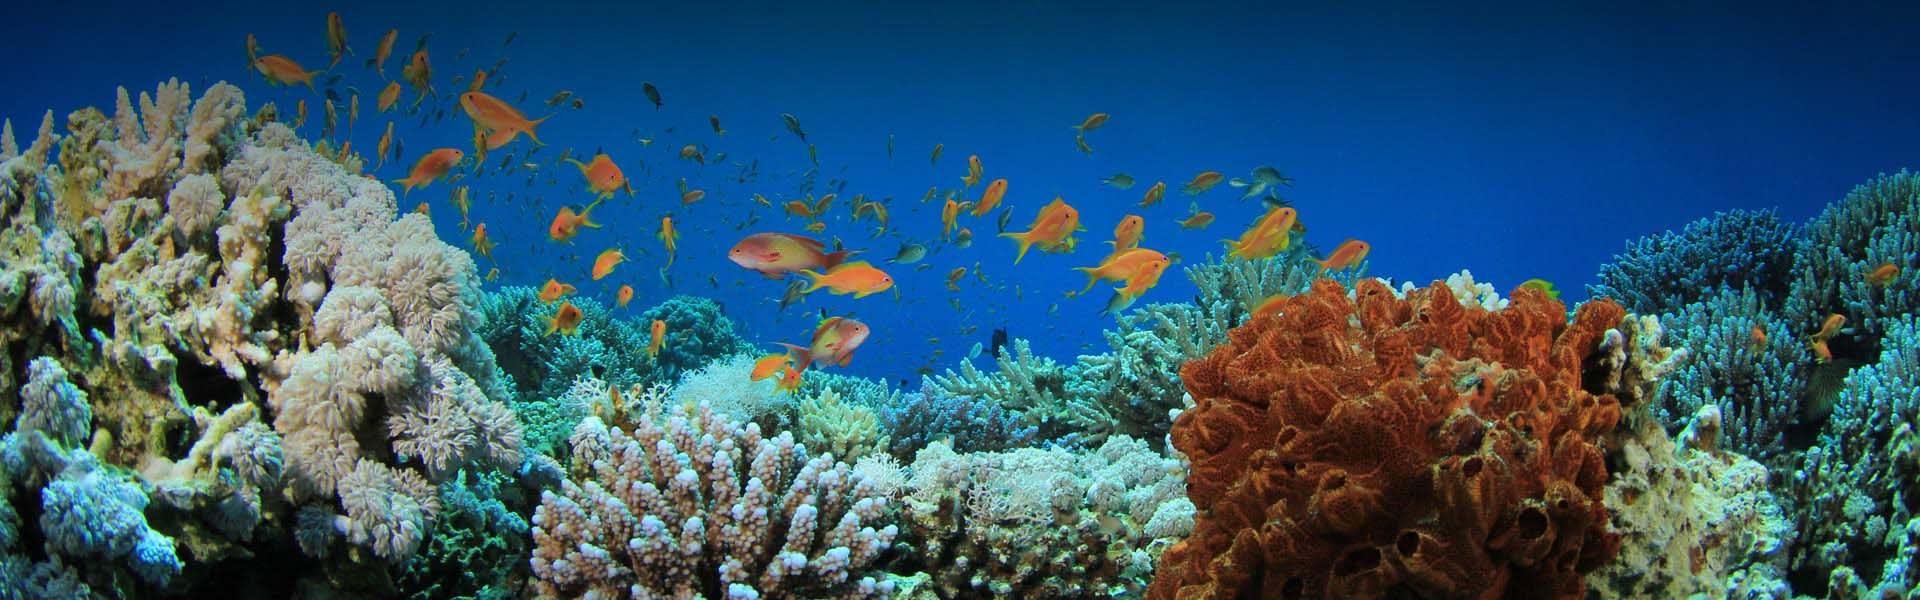 Anantara Dhigu Family Resort Coral Reef